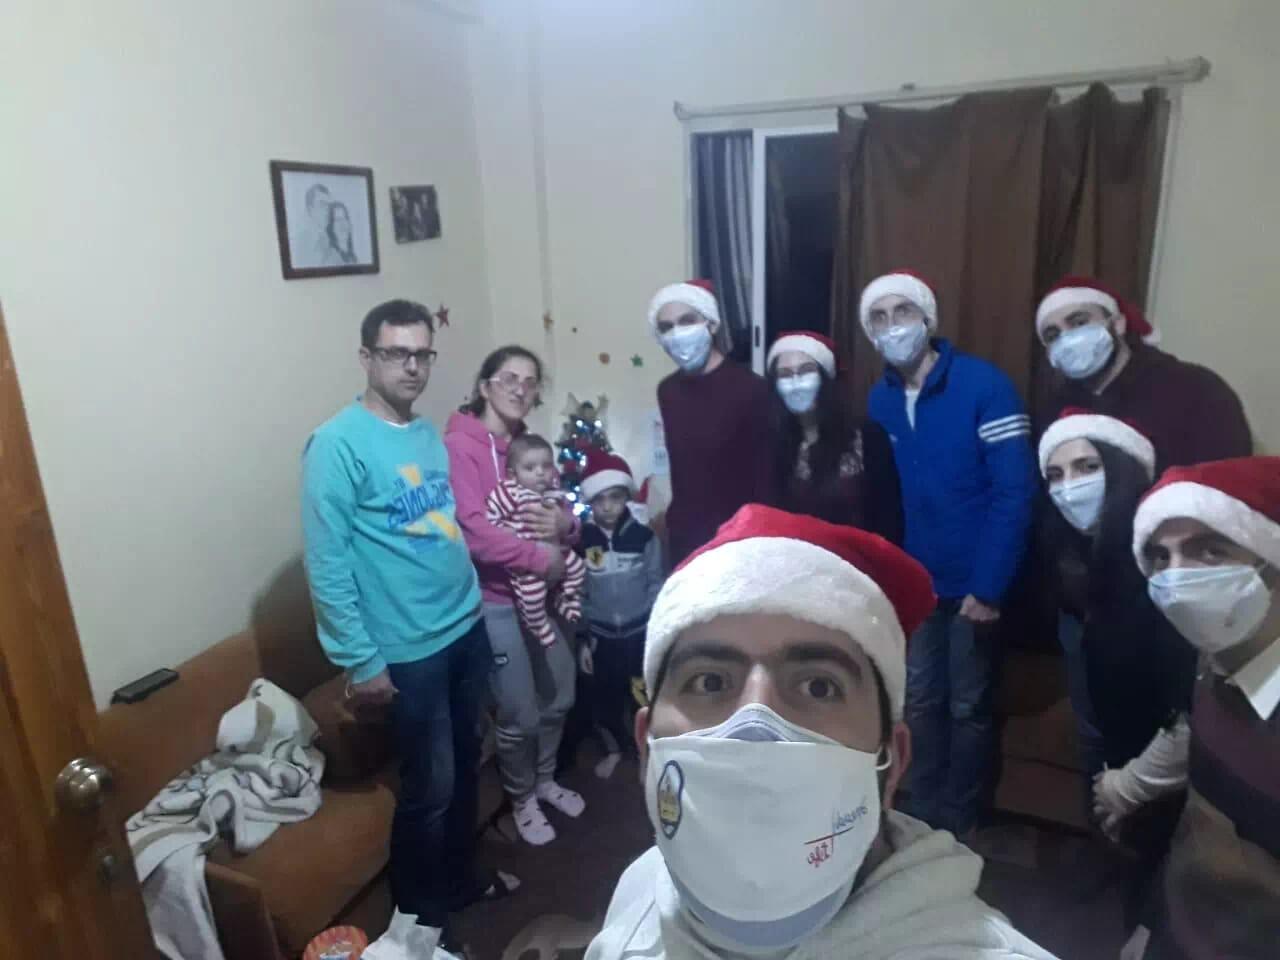 https://eundemia.sirv.com/Images/christmas/456832.webp